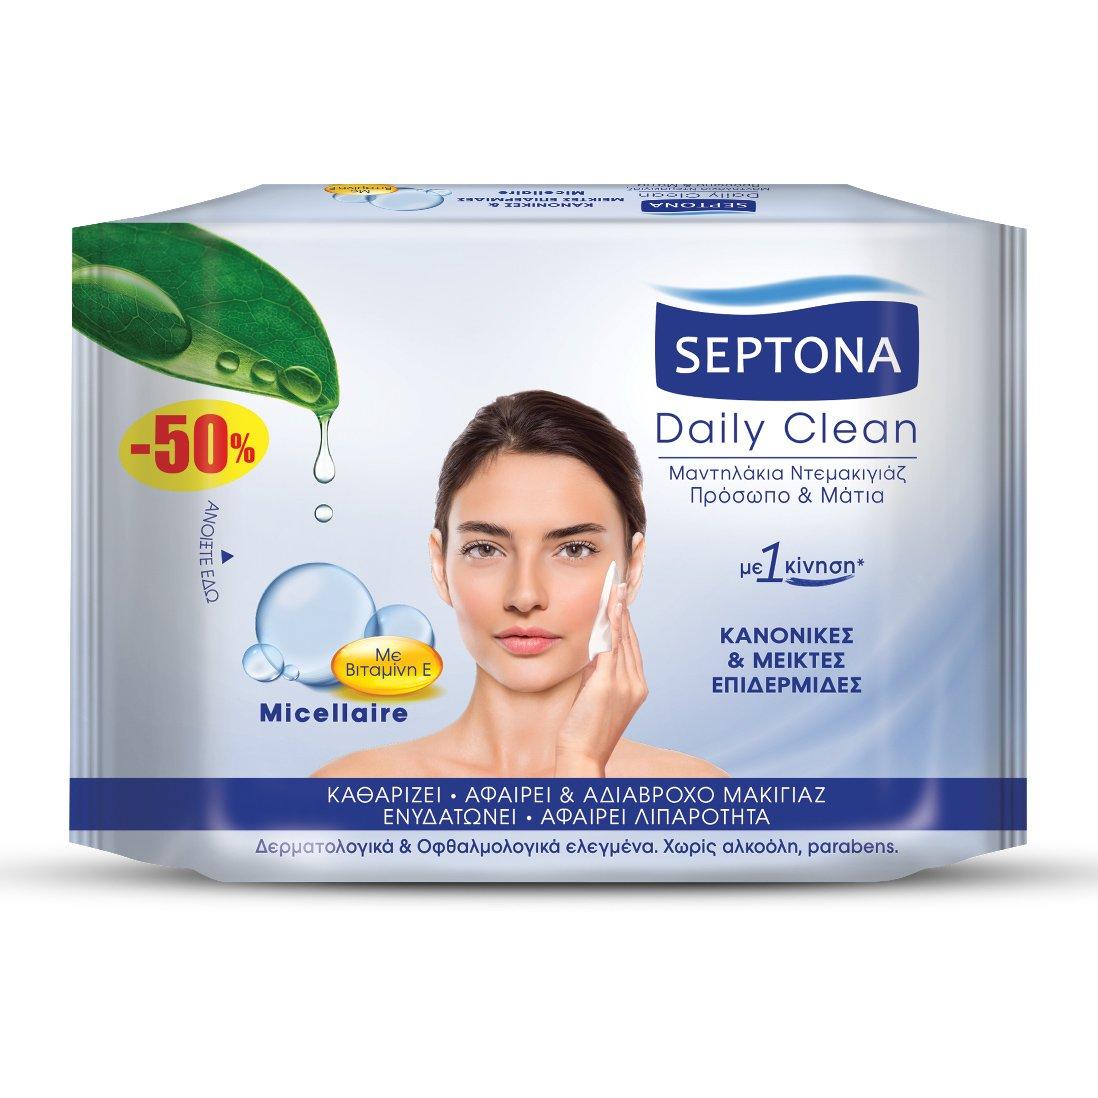 Septona Daily Clean Micellaire Μαντηλάκια Ντεμακιγιάζ Προσώπου Ματιών με Βιταμίνη E για Κανονικές Μεικτές Επιδερμίδες 20 Wipes